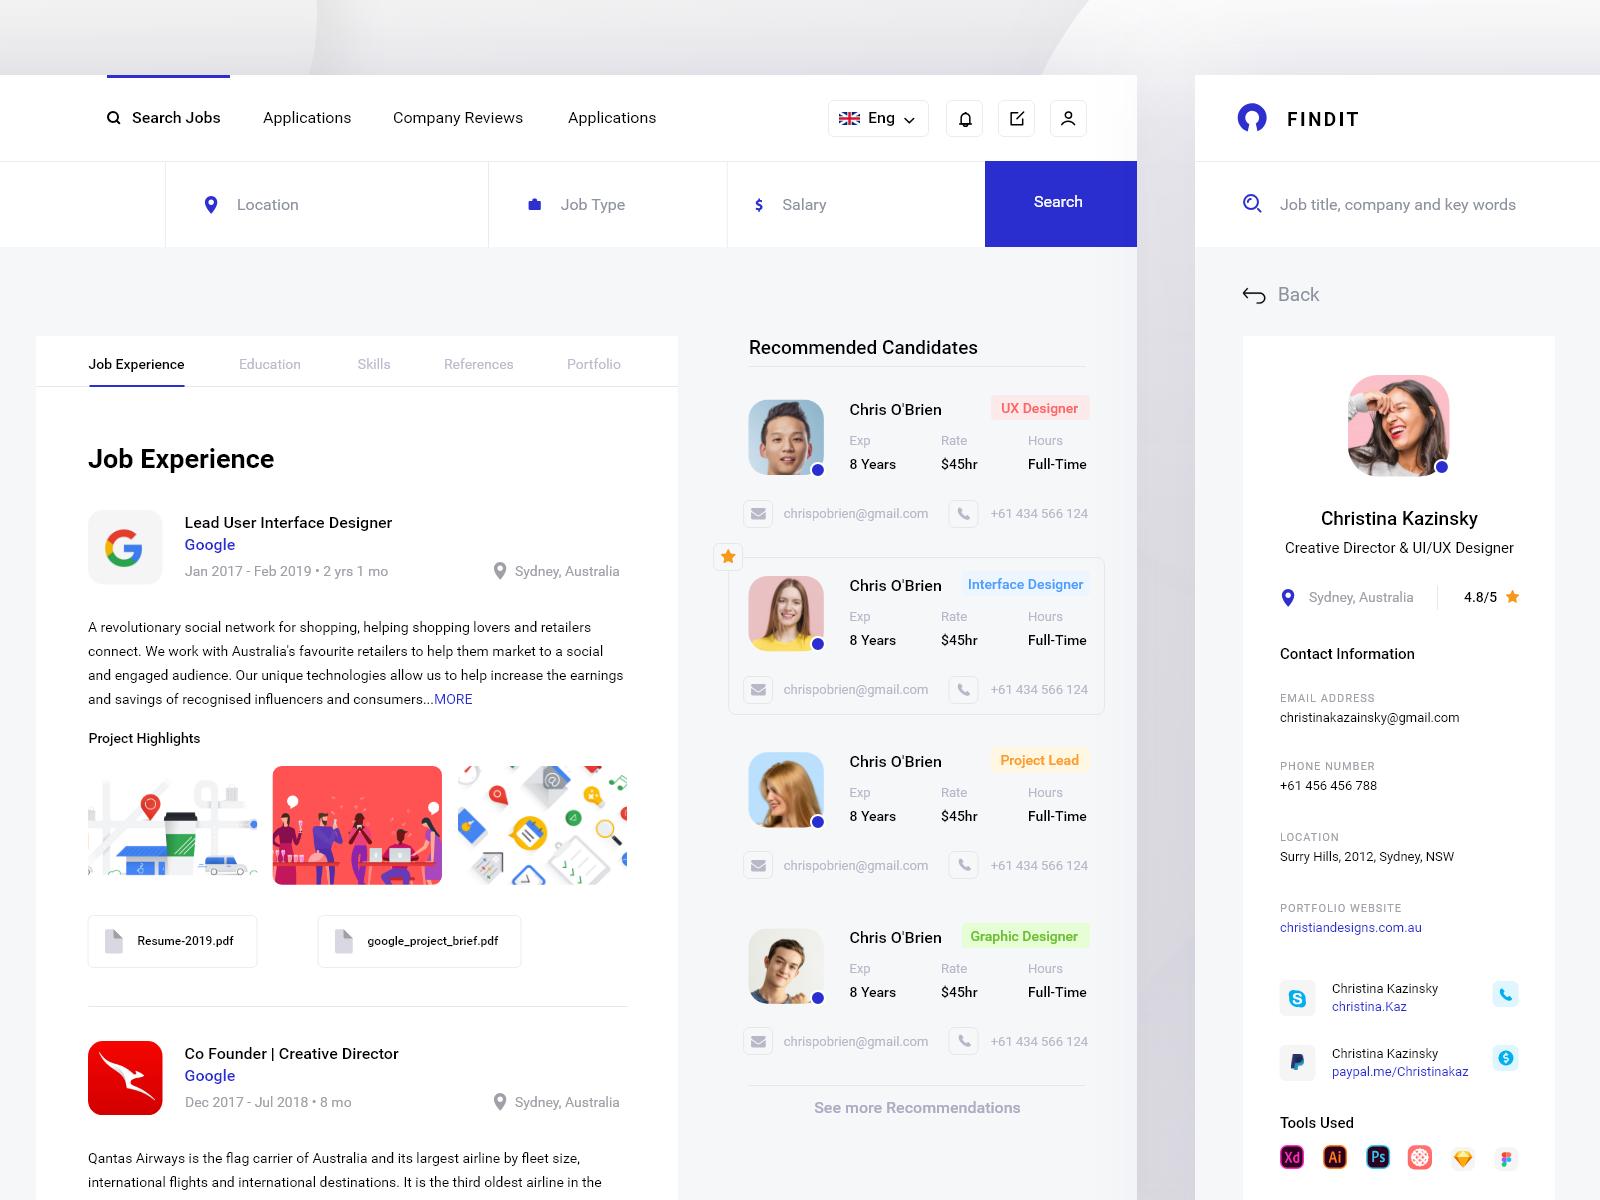 Job Application Process Dashboard pt3 by Monty Hayton | Design